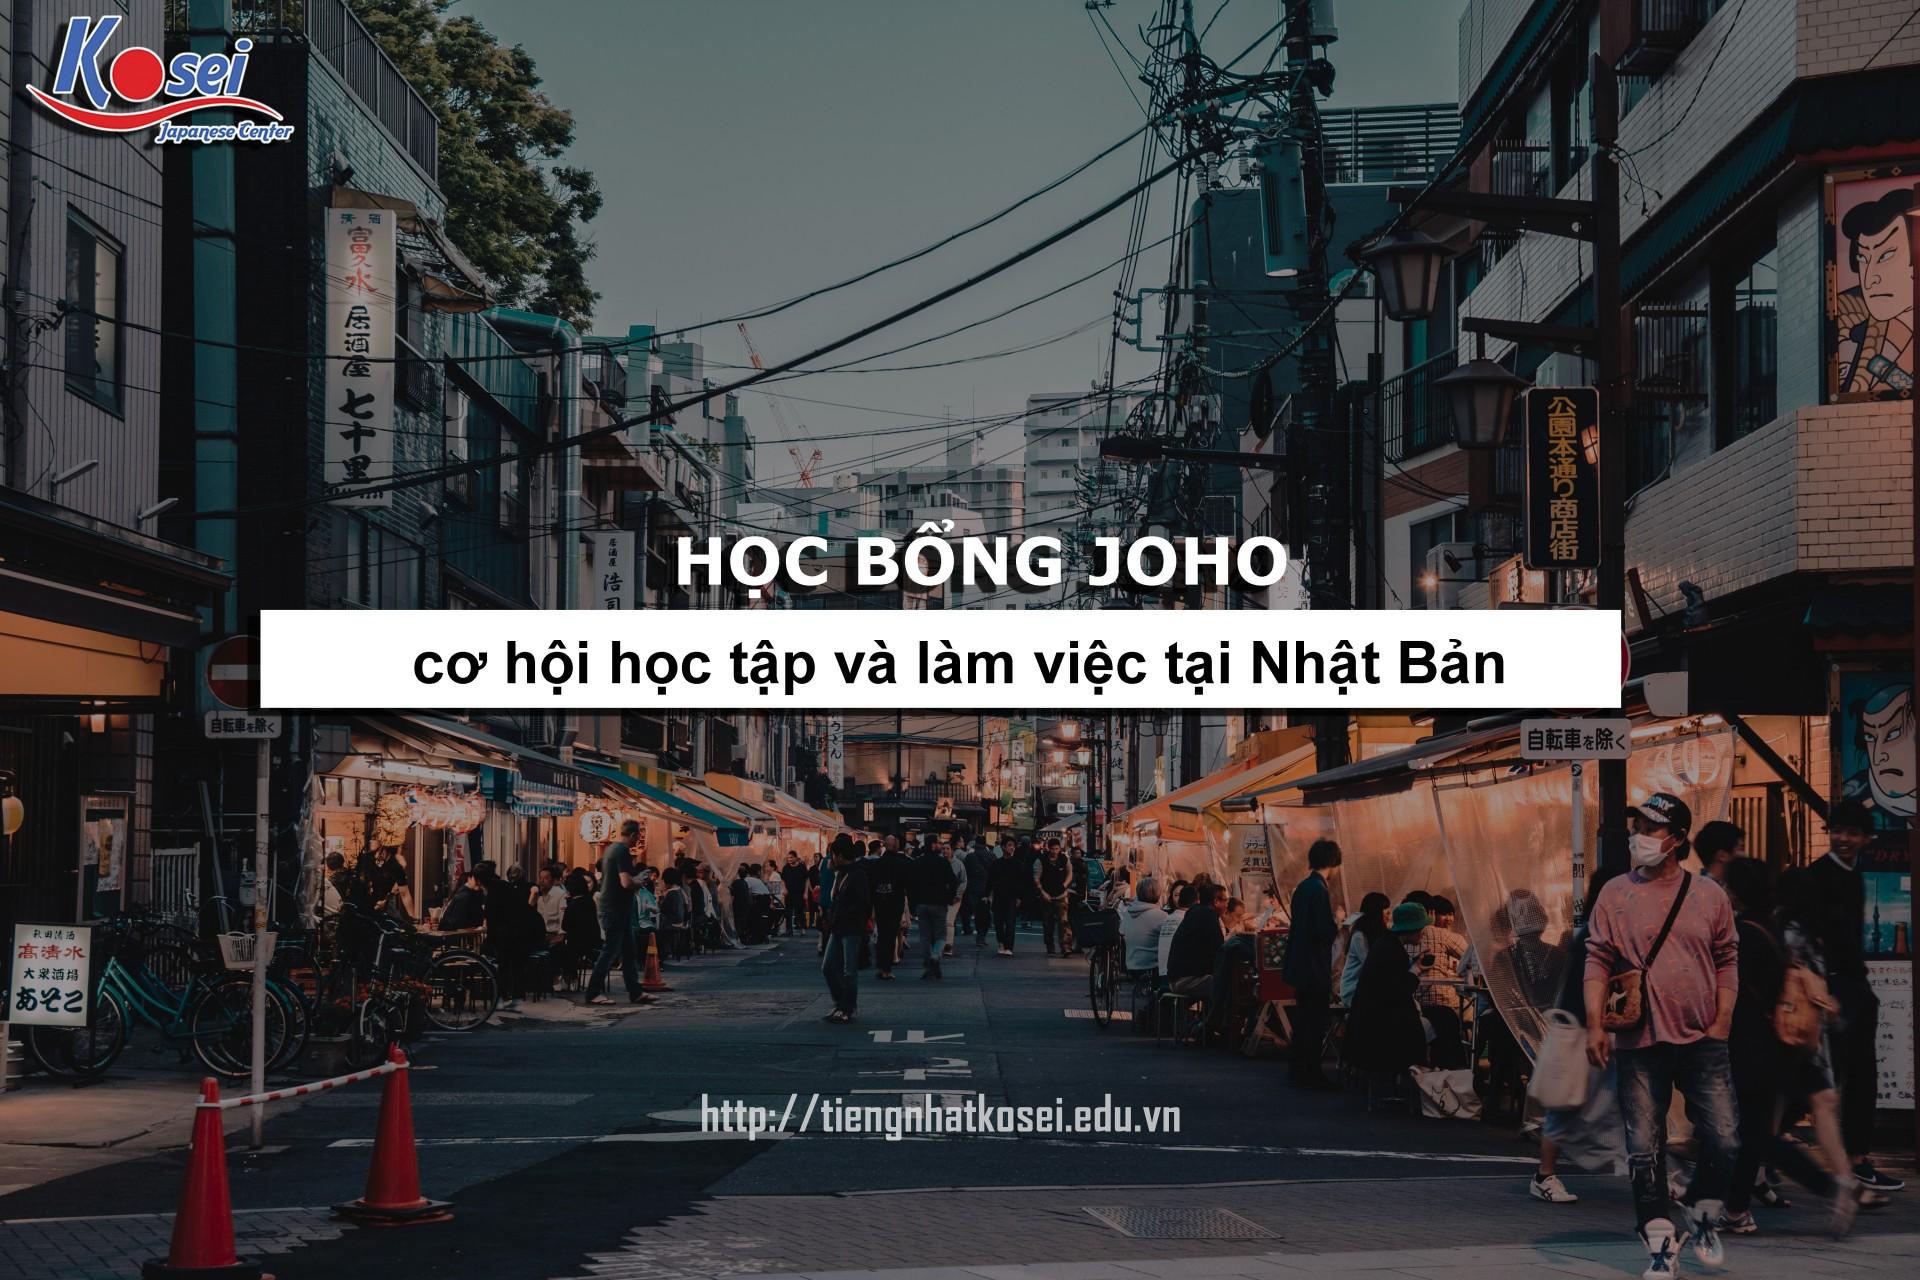 https://kosei.vn/tuyen-sinh-hoc-bong-du-hoc-joho-ky-thang-4-2019-n1731.html